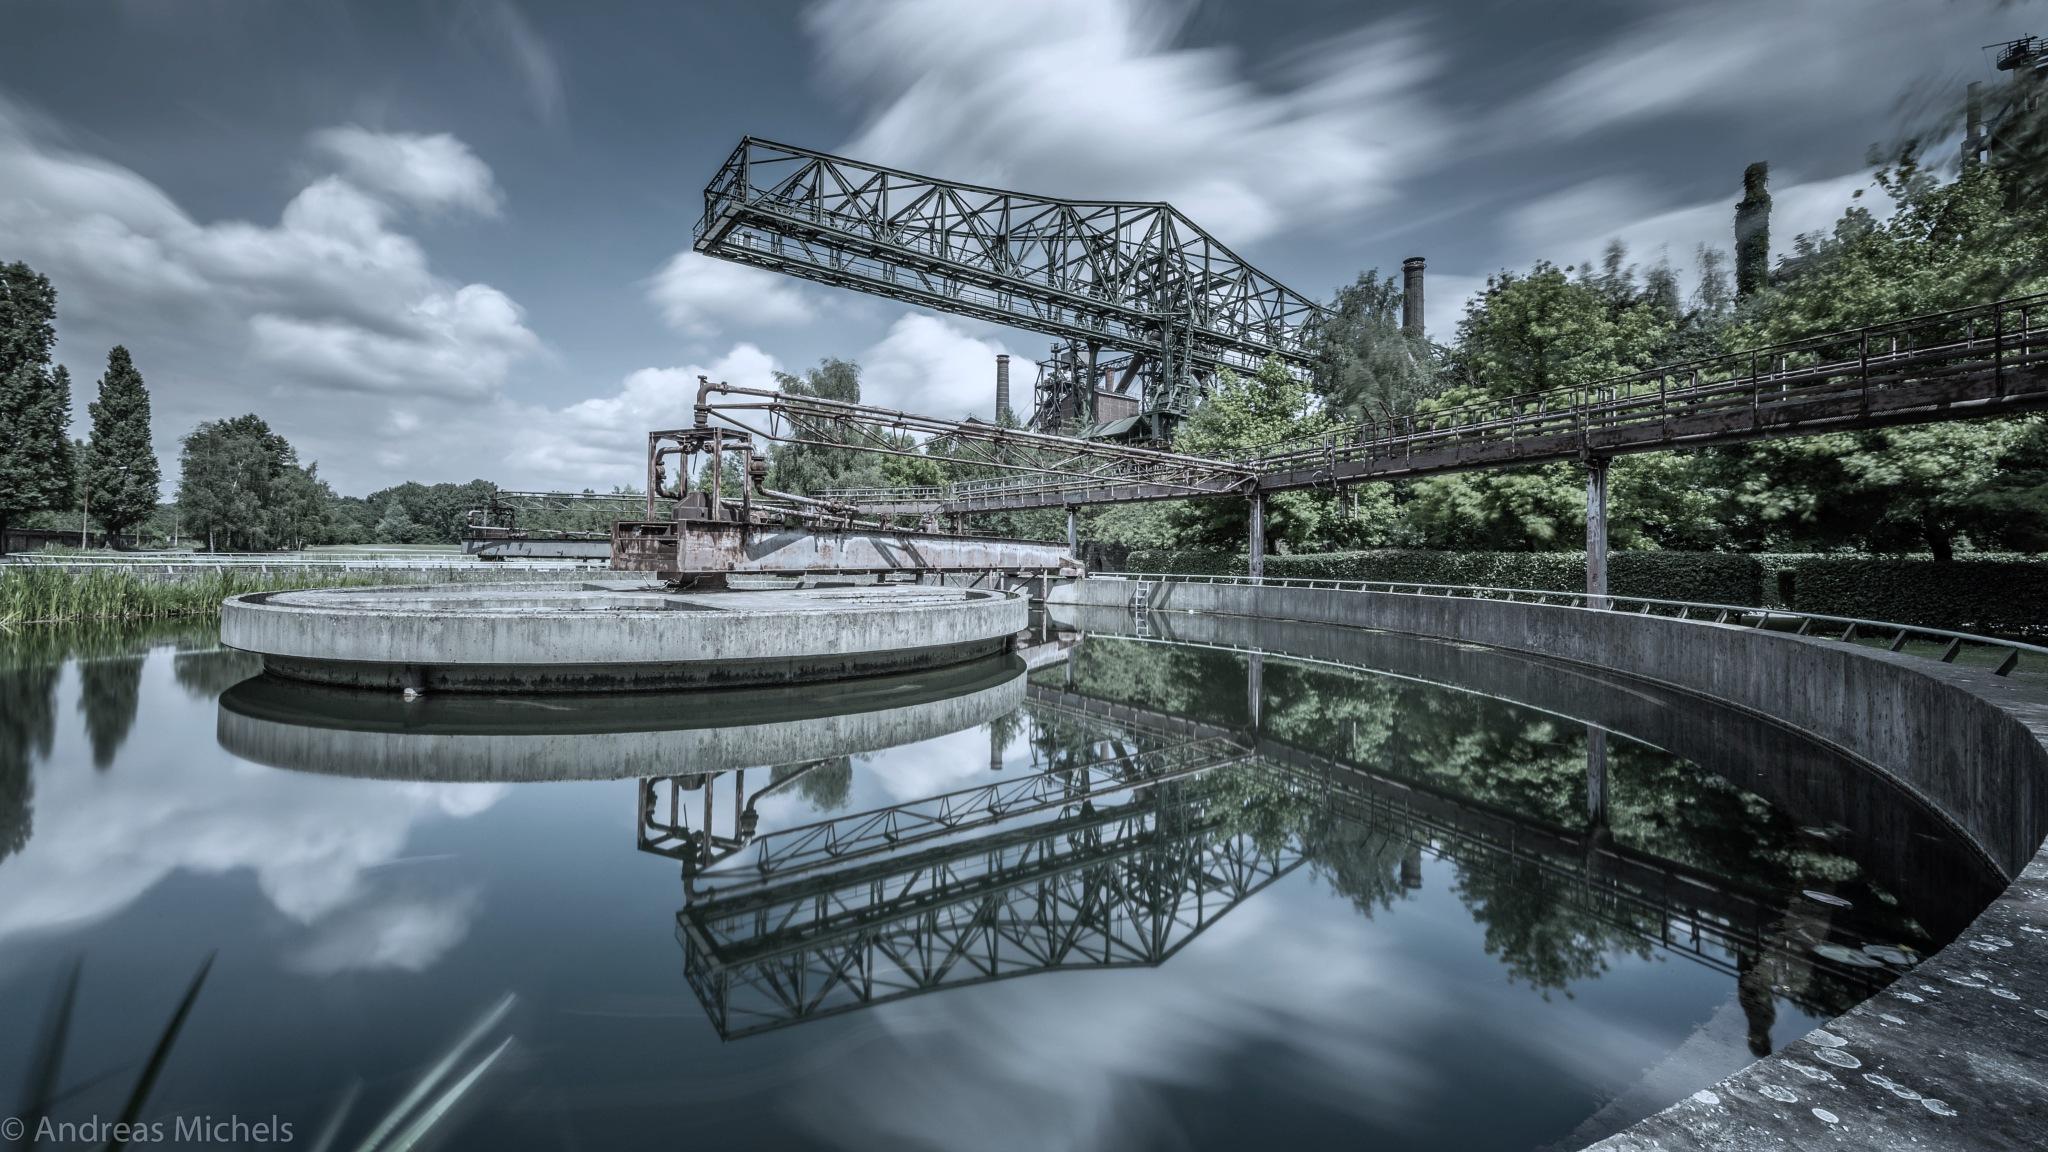 Landschaftspark Duisburg-Nord by Andreas Michels